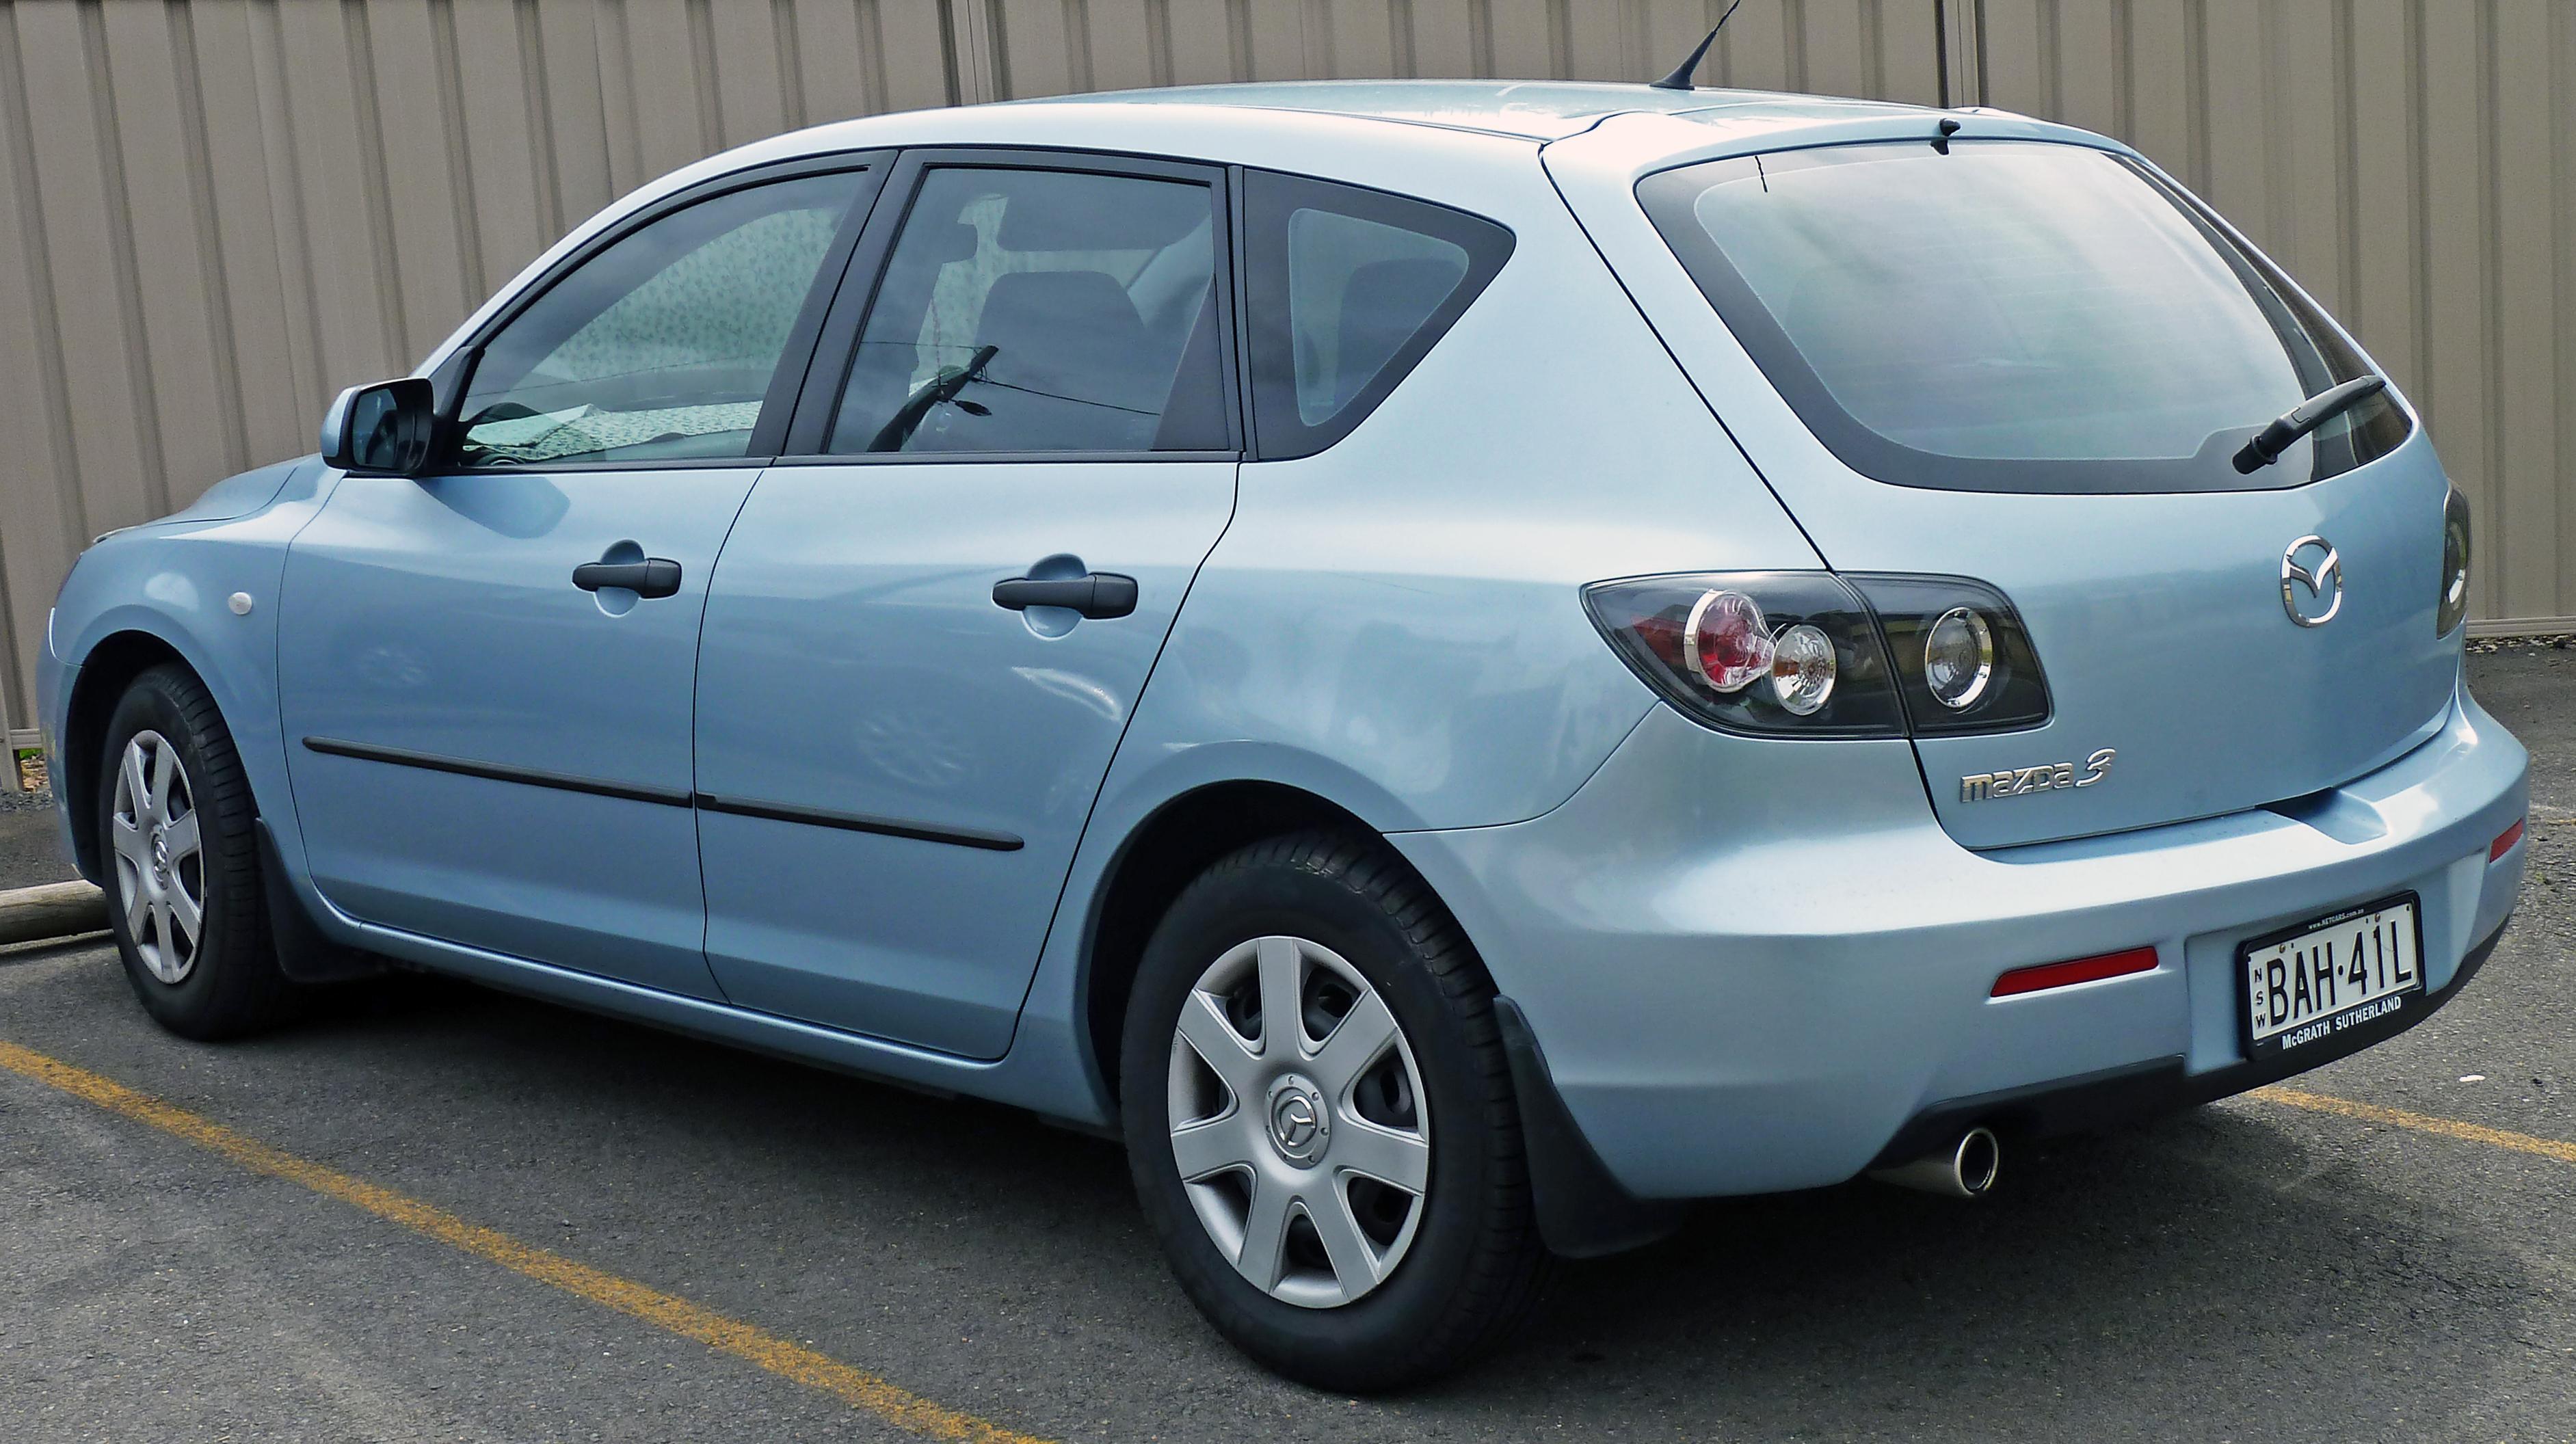 File:2006 2008 Mazda 3 (BK Series 2) Neo Hatchback 03.